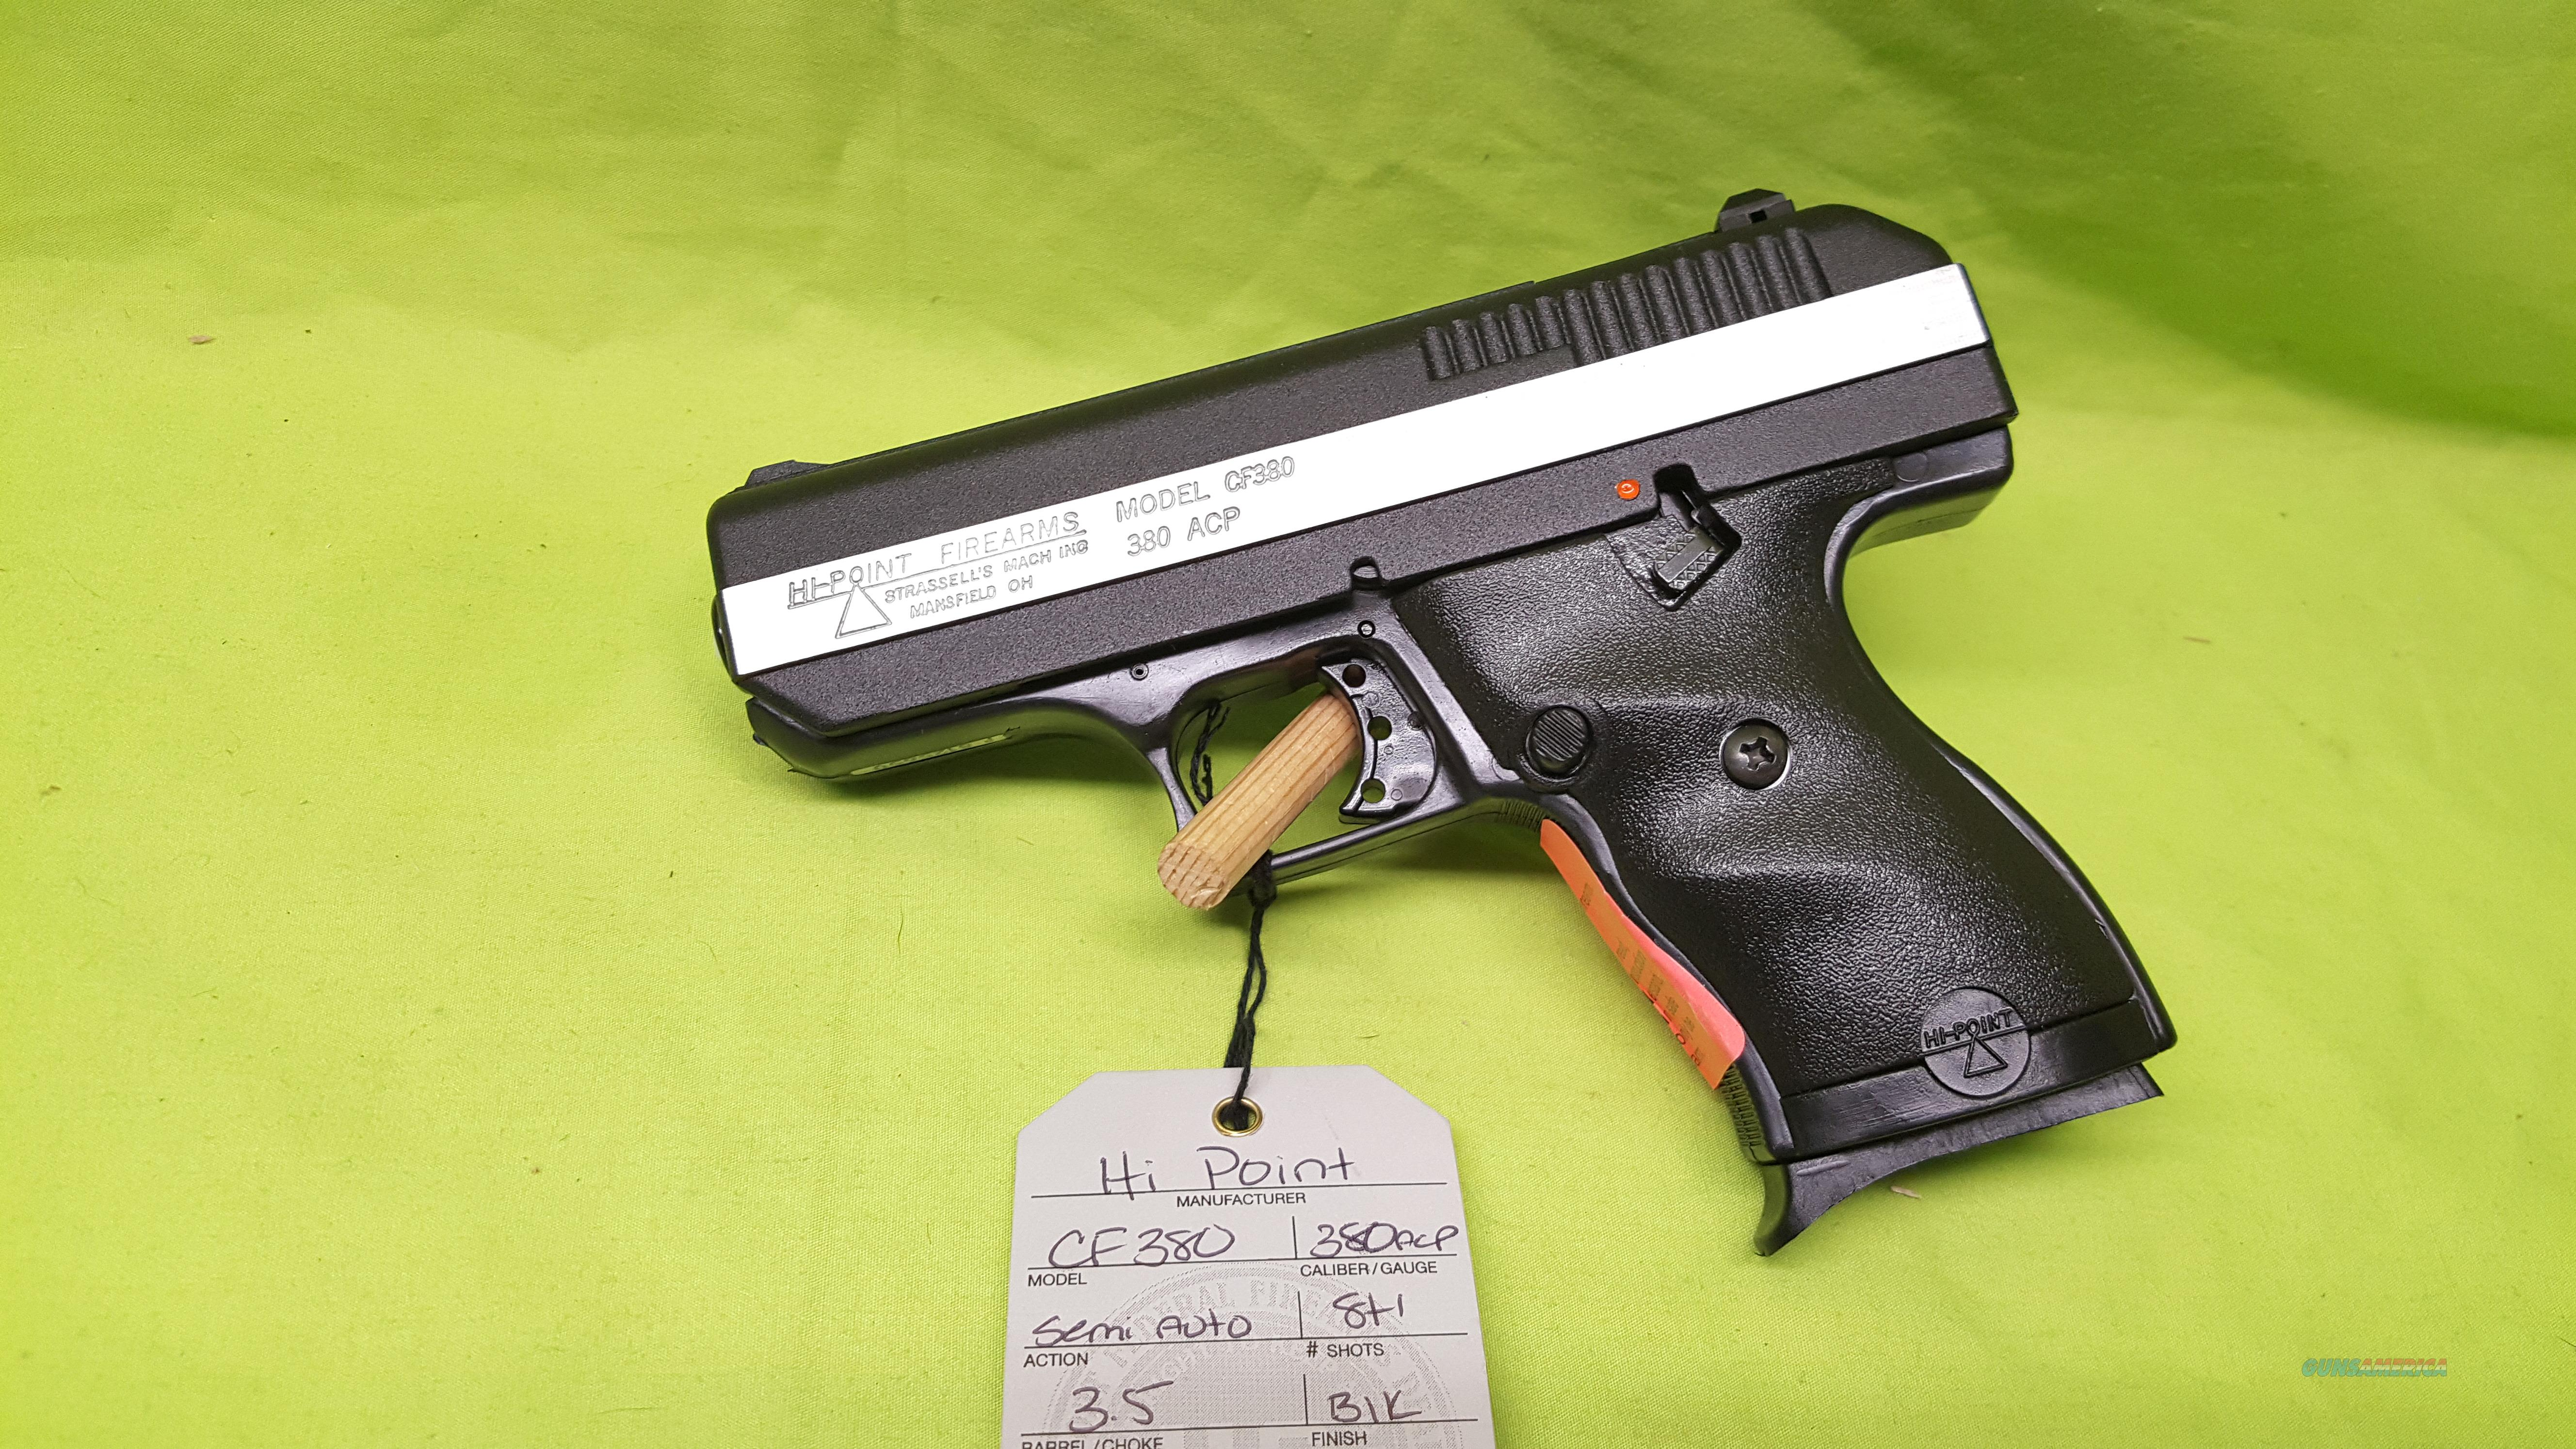 Hi Point 380 For Sale - Hi point cf380 380 acp hi point cf 380 8 1 duotone guns